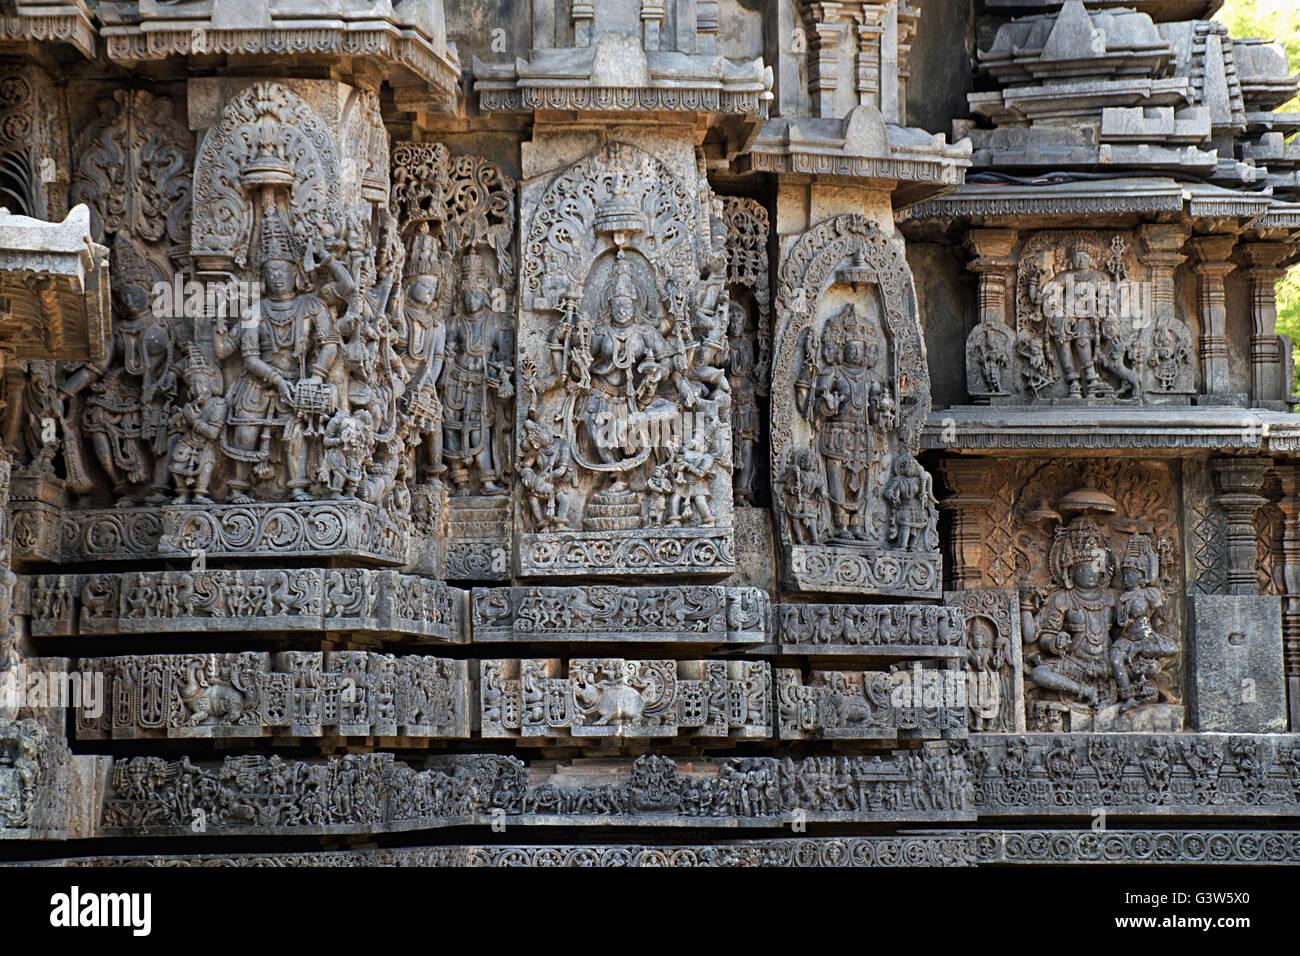 Ornate wall panel reliefs depicting Hindu deities, west side, Hoysaleshwara temple, Halebidu, Karnataka, india. - Stock Image